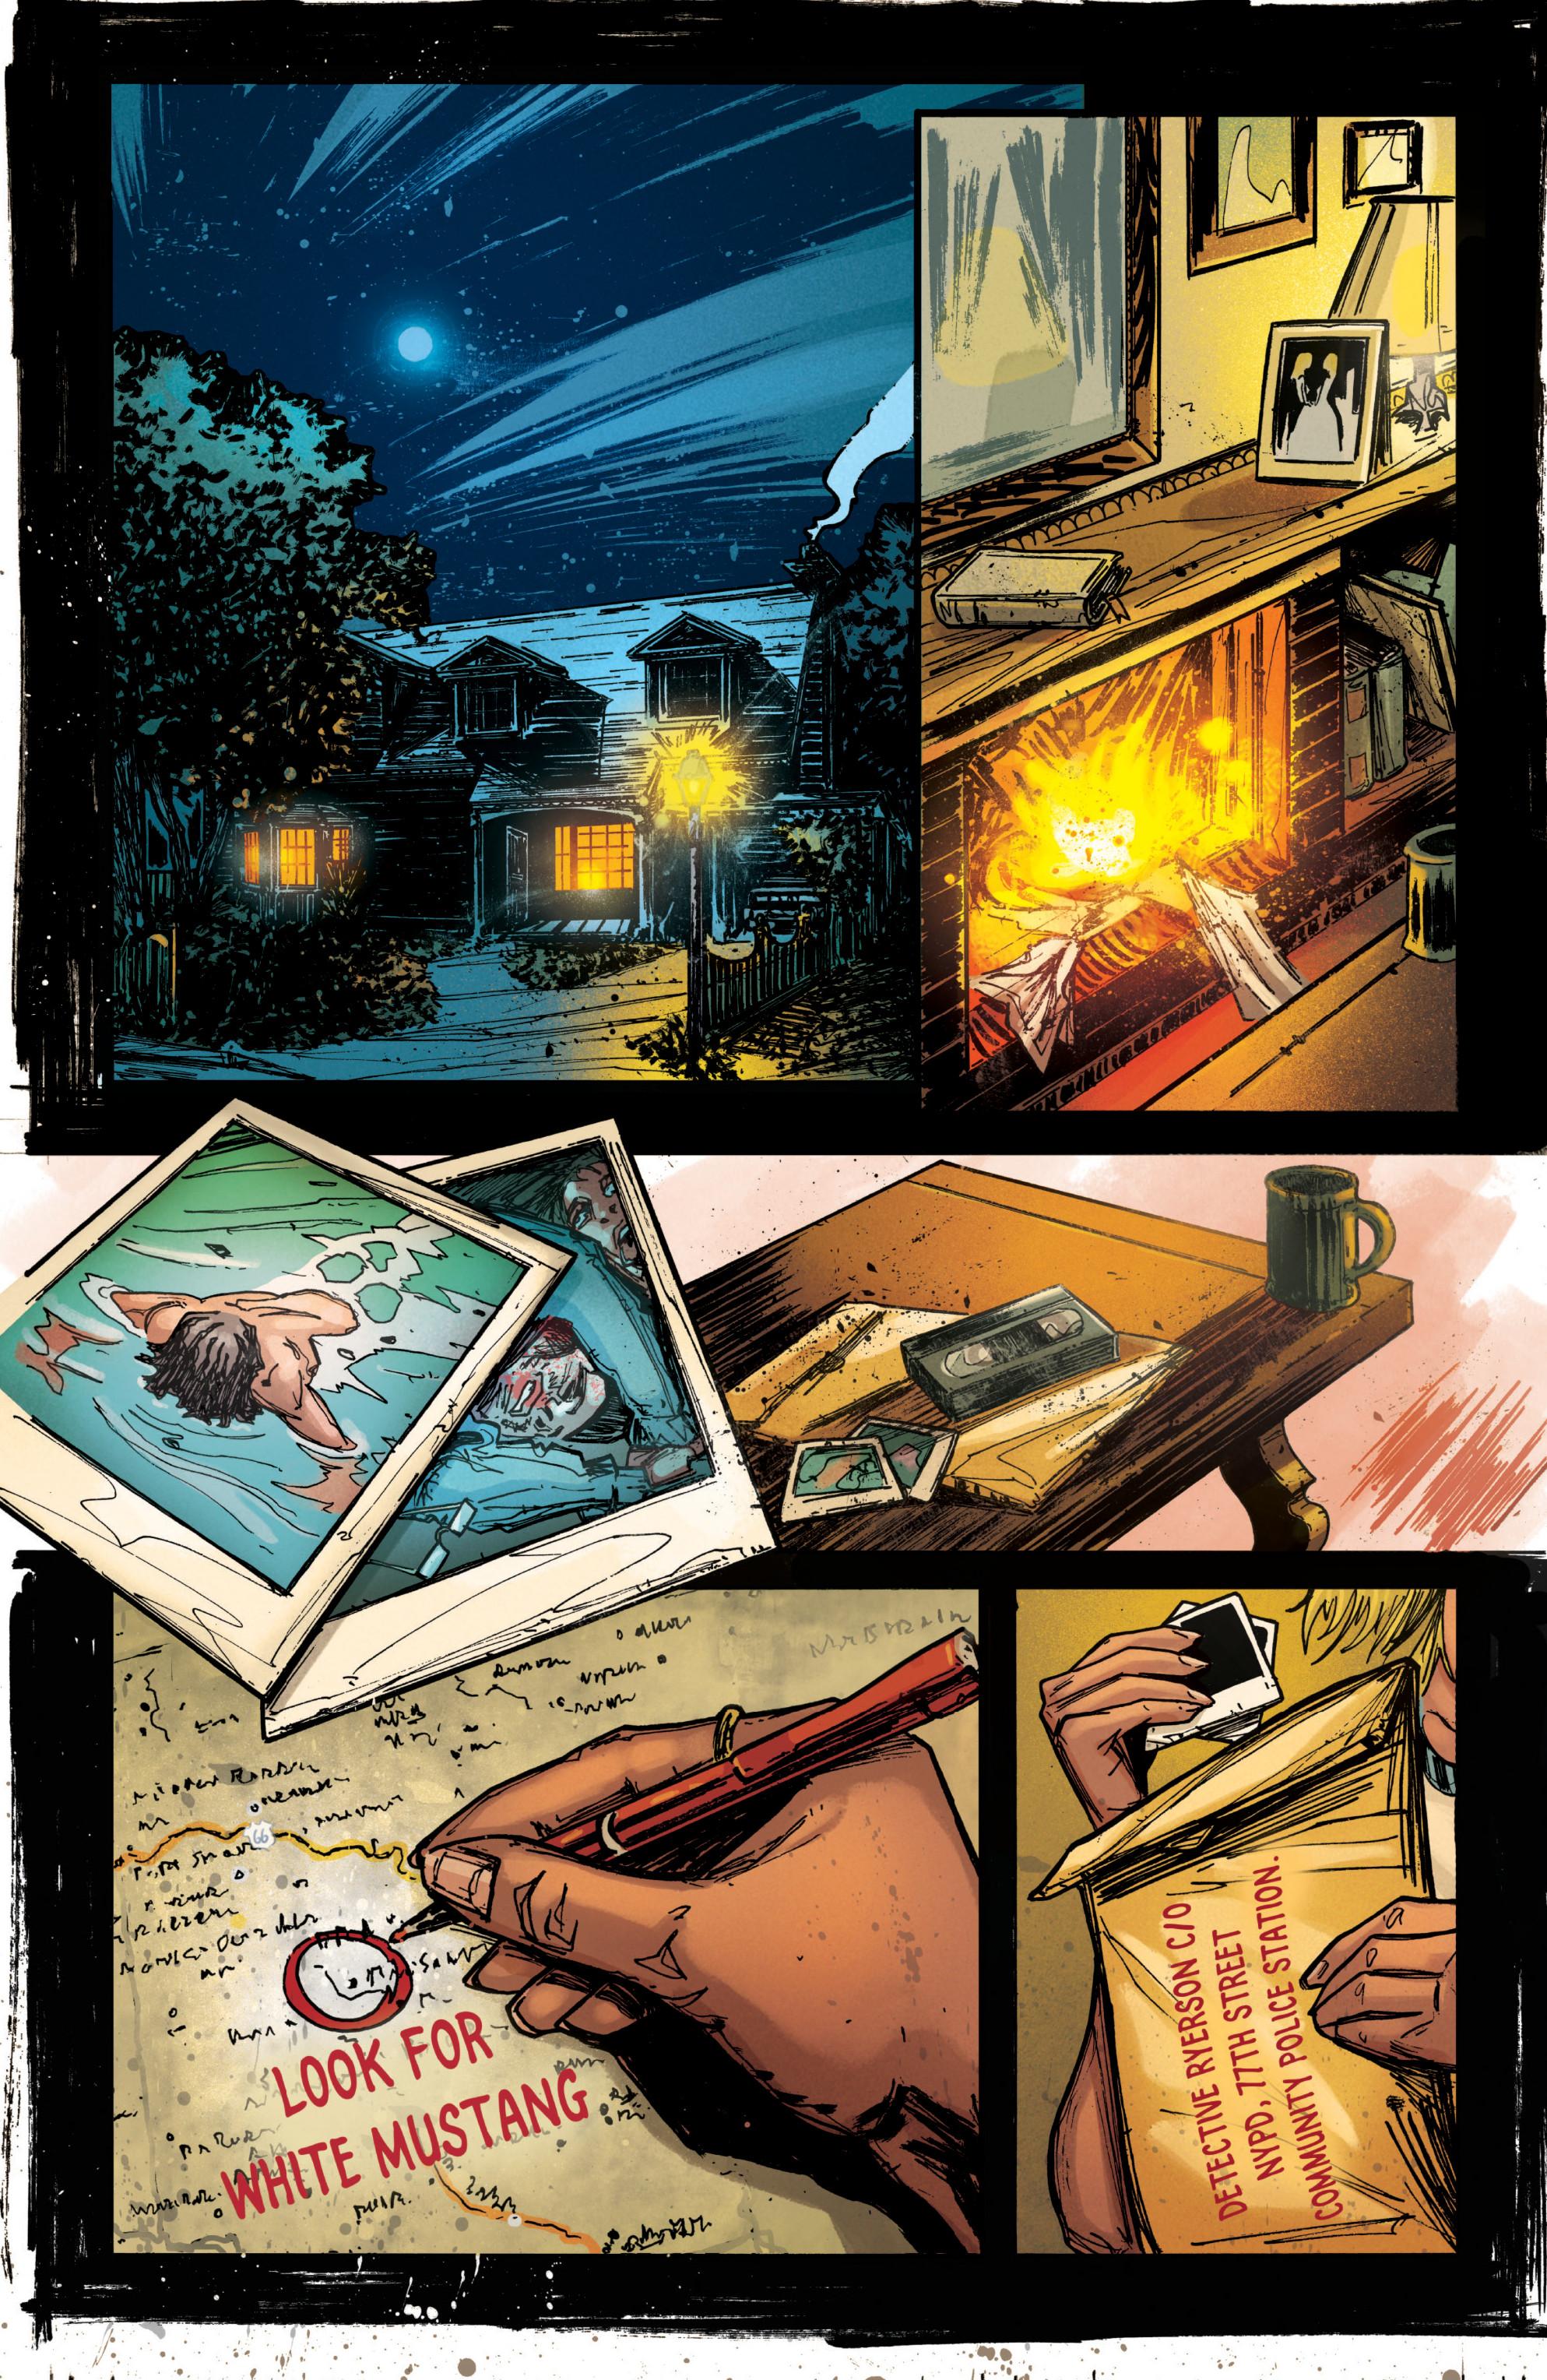 Read online Grimm Tales of Terror: Vol. 3 comic -  Issue #5 - 23